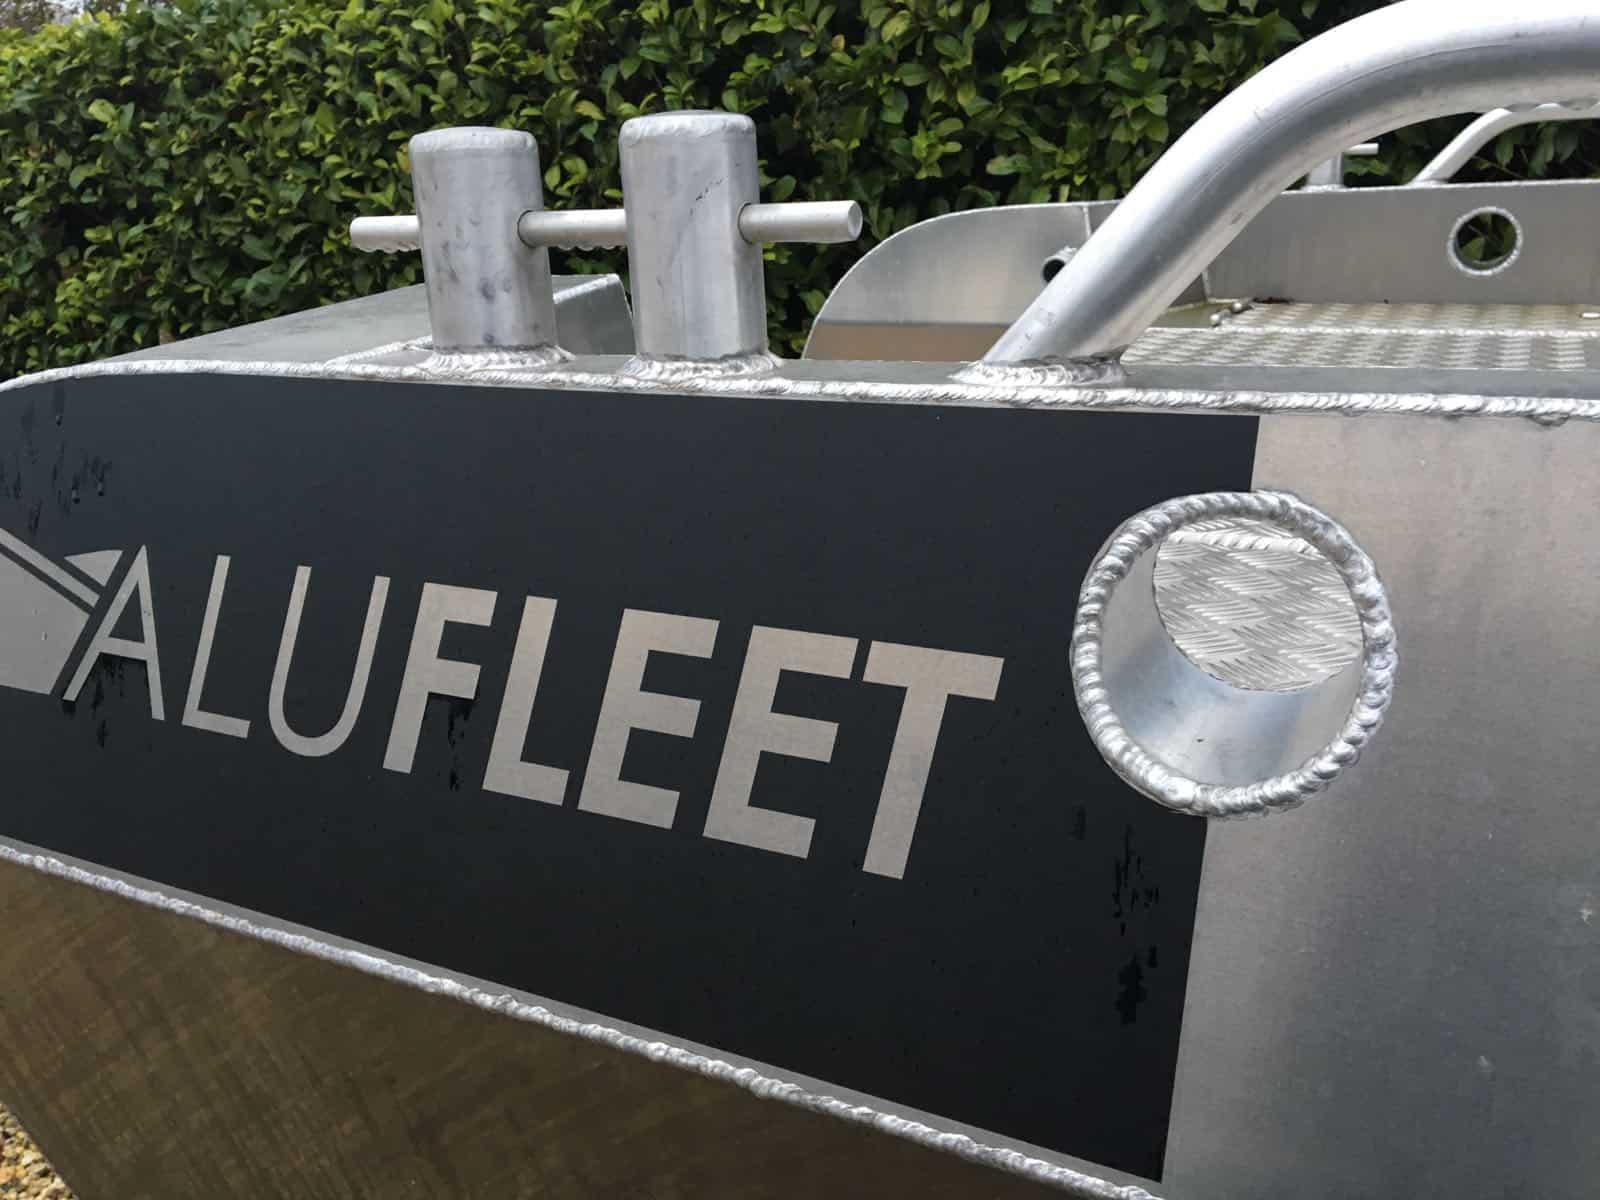 Alufleet logo op boot